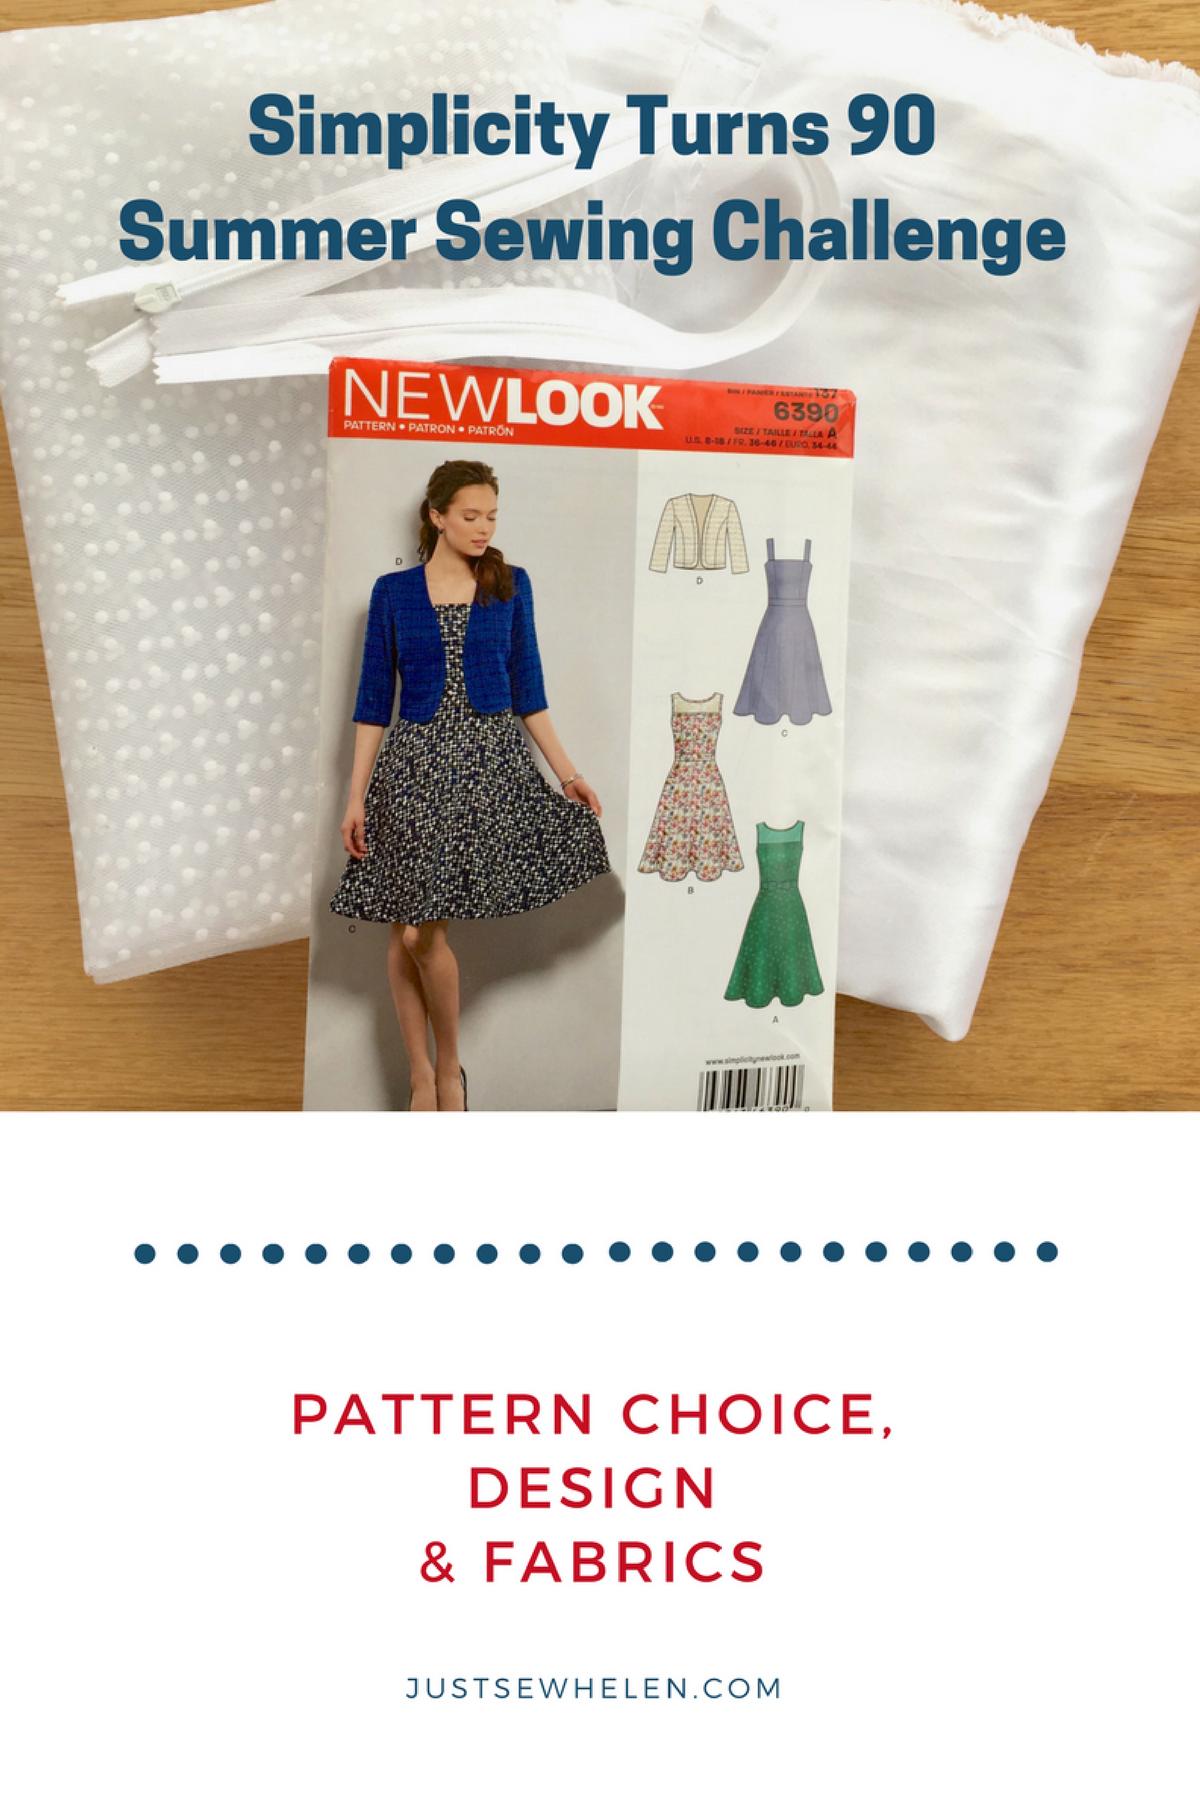 Fabric, design, pattern JustSewHelen.com #SimplicityTurns90 #SummerSewingChallenge #SimplicityByMe